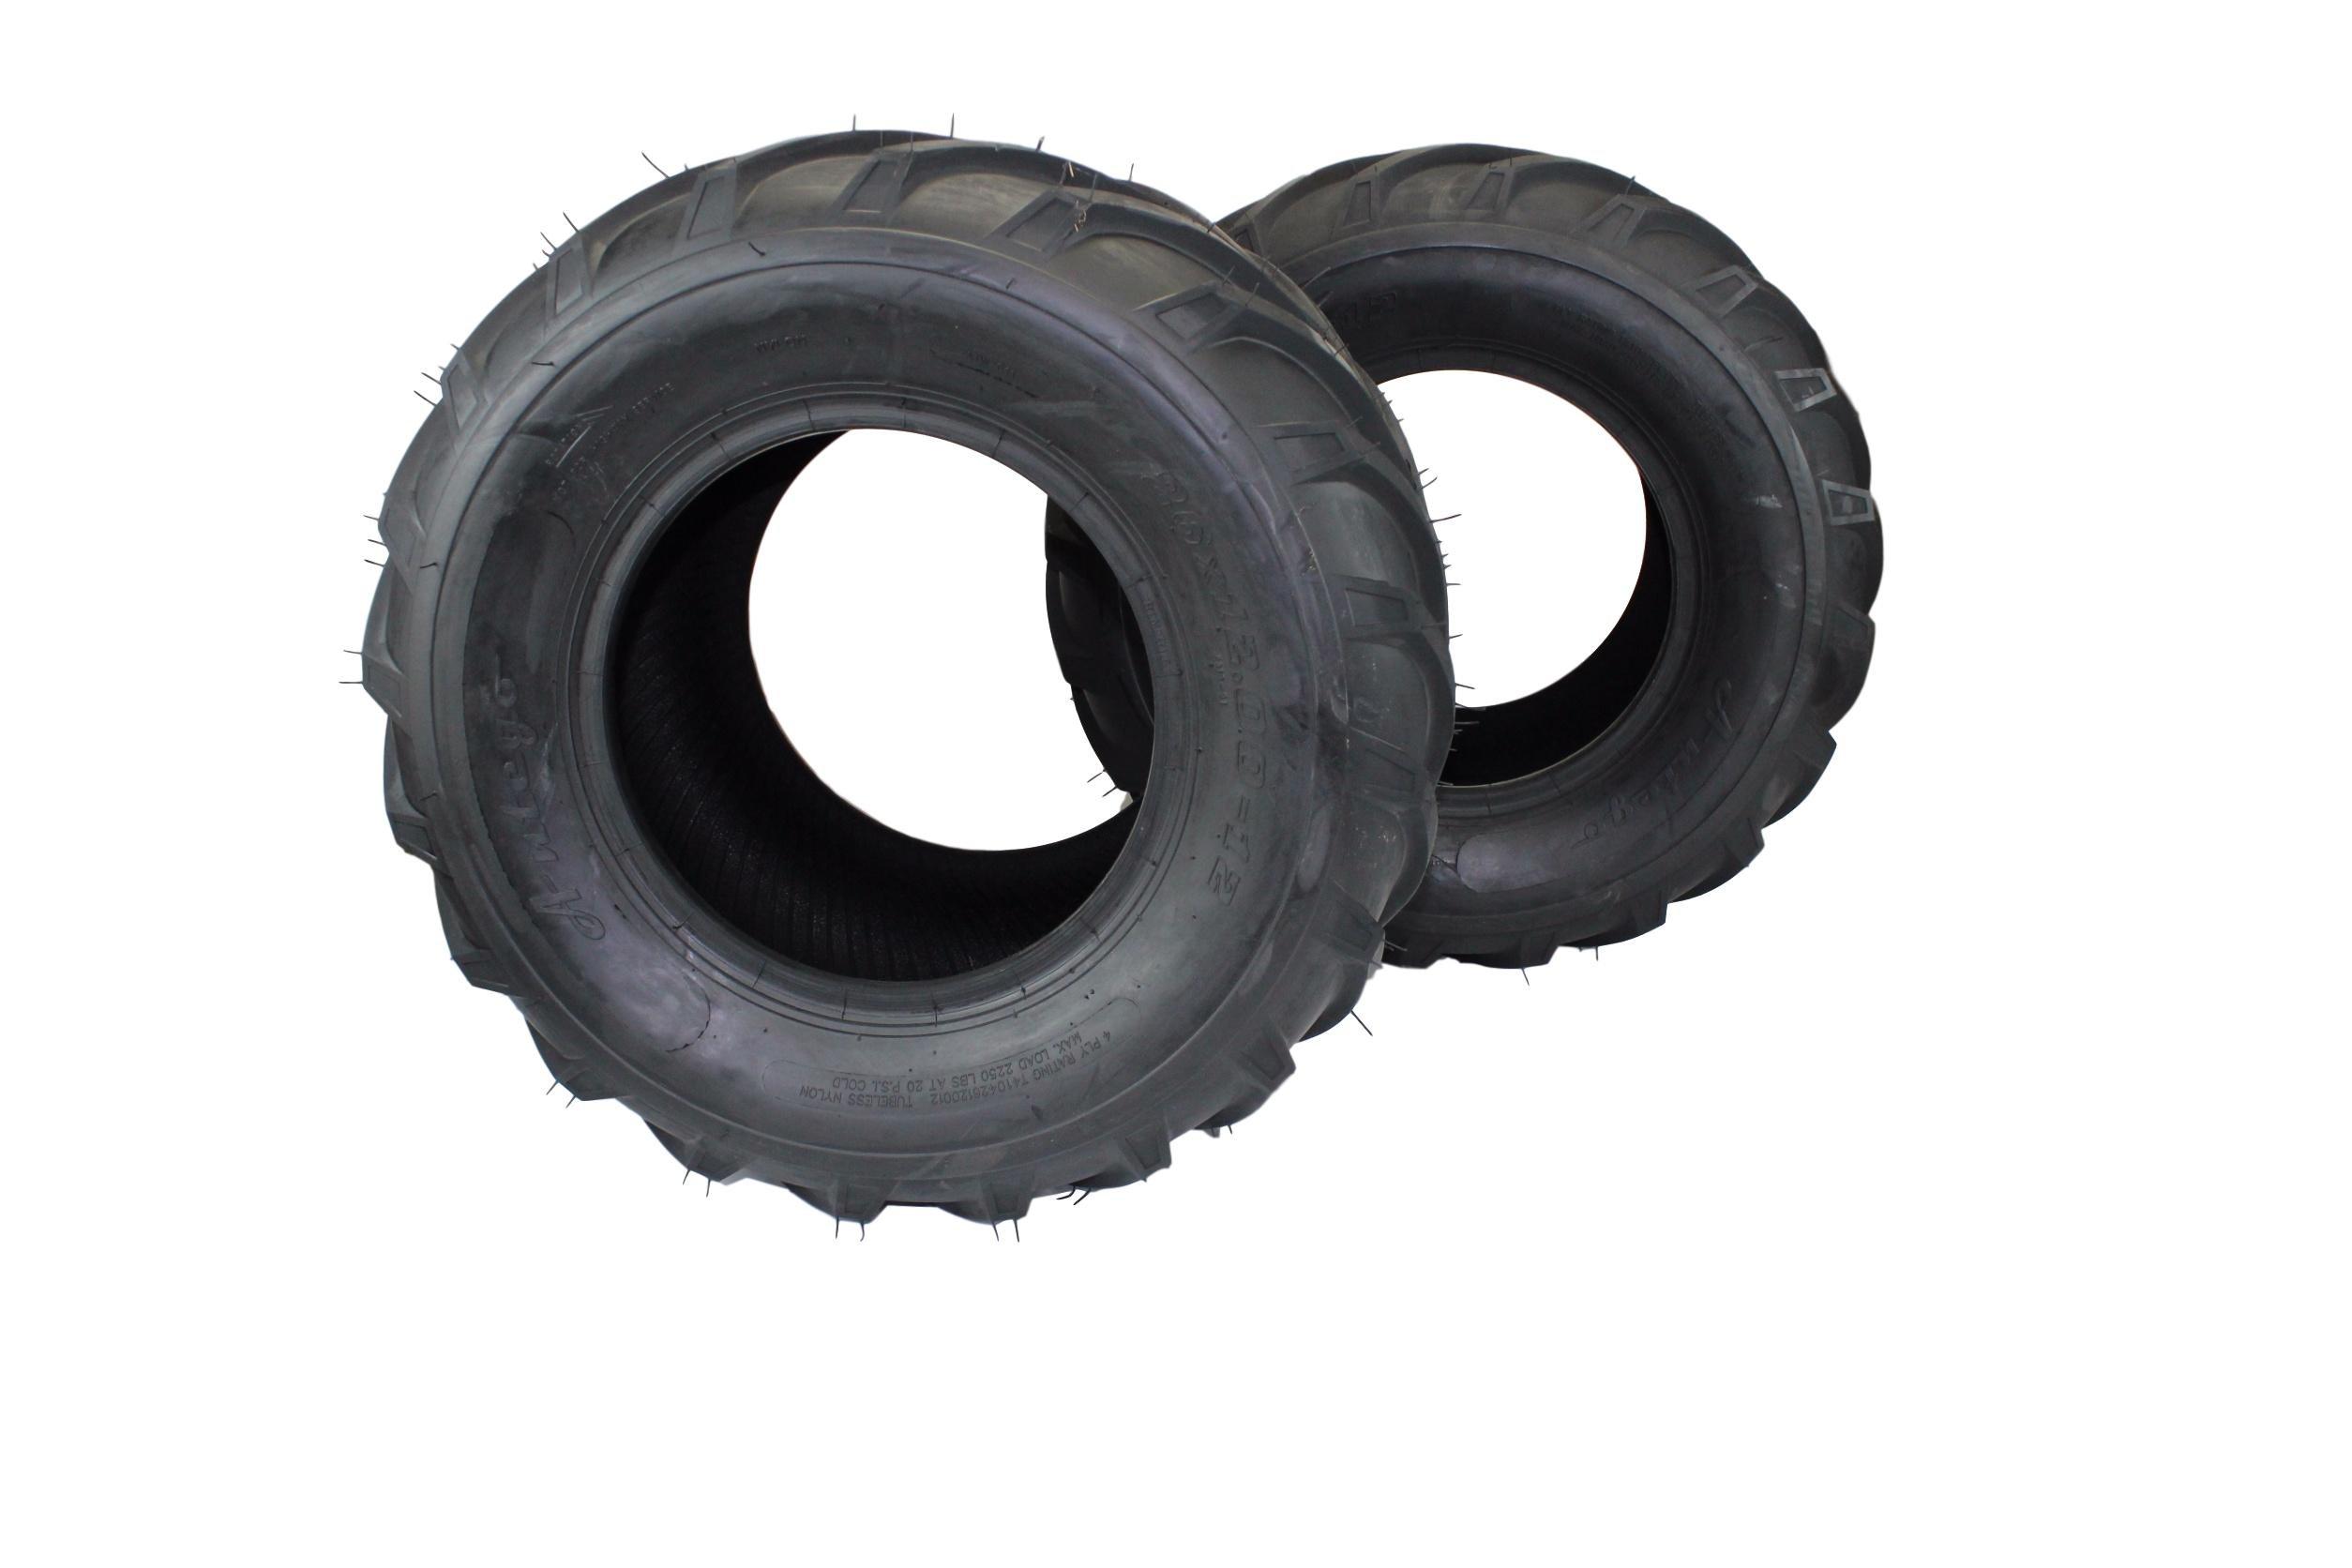 (Set of 2) 26x12.00-12 ATV/UTV, Lawn & Garden, Lawn Tractor, Mower Tires 4 Ply ATW-041